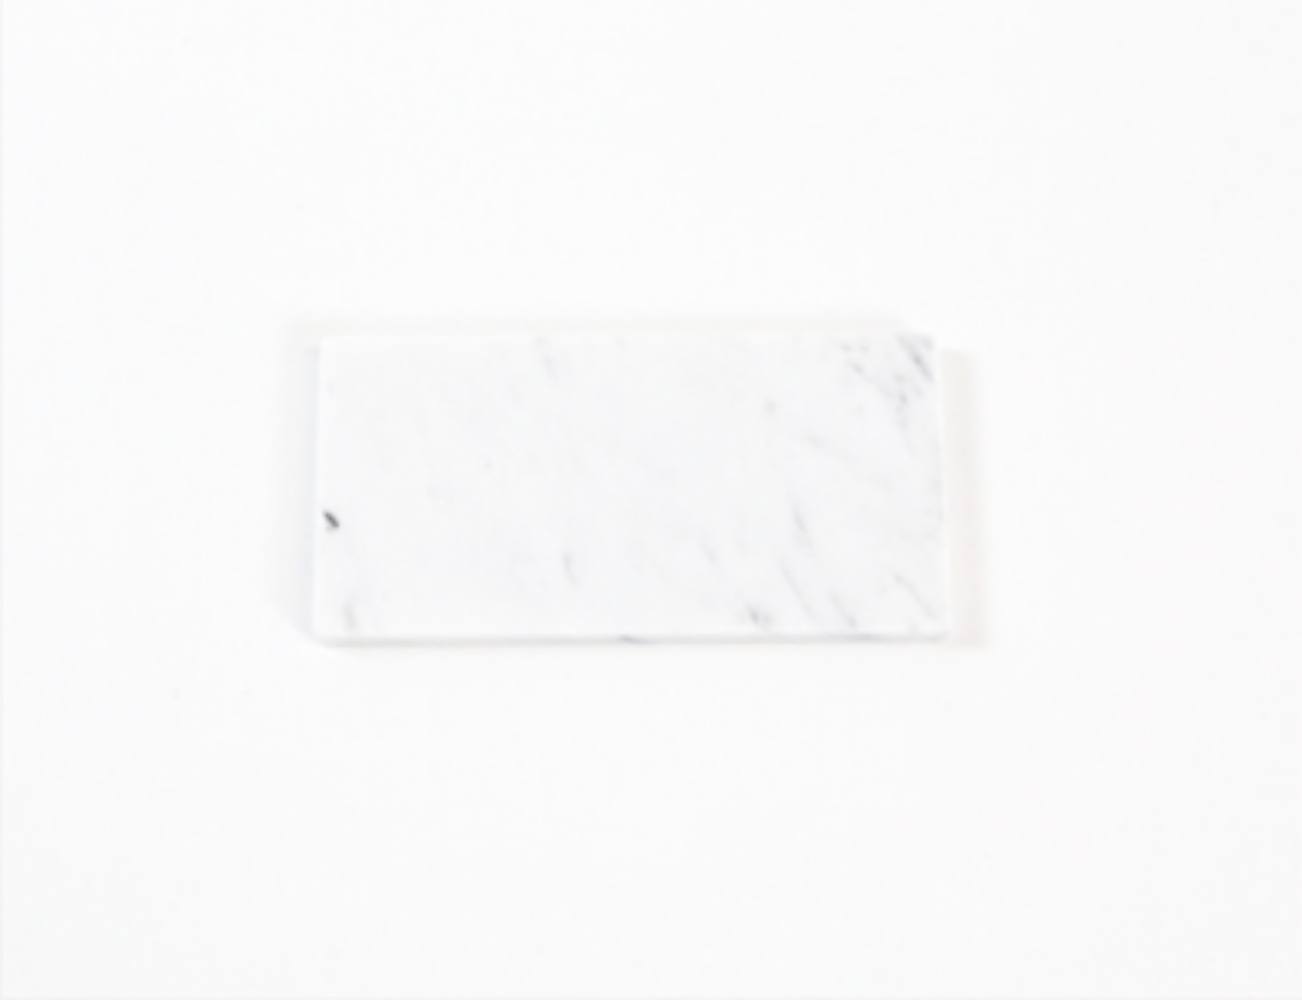 Bianco Carrara Marble Polished 3 X6 Mysite Carrara Marble Bianco Carrara Carrara